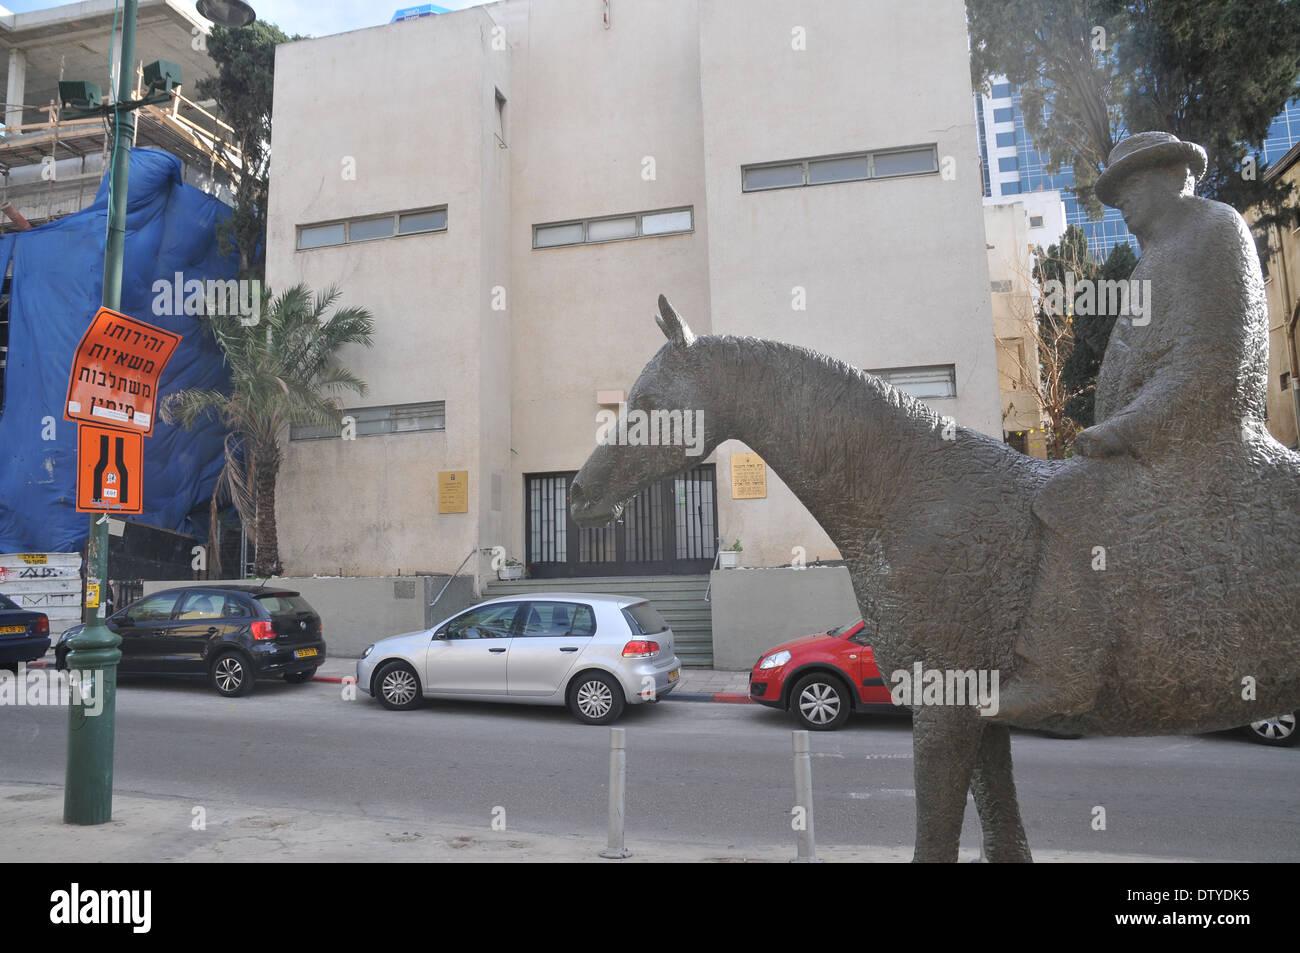 Israel, Tel Aviv, Rothschild Boulevard Statue of Meir Dizengoff first mayor of Tel Aviv on his horse - Stock Image